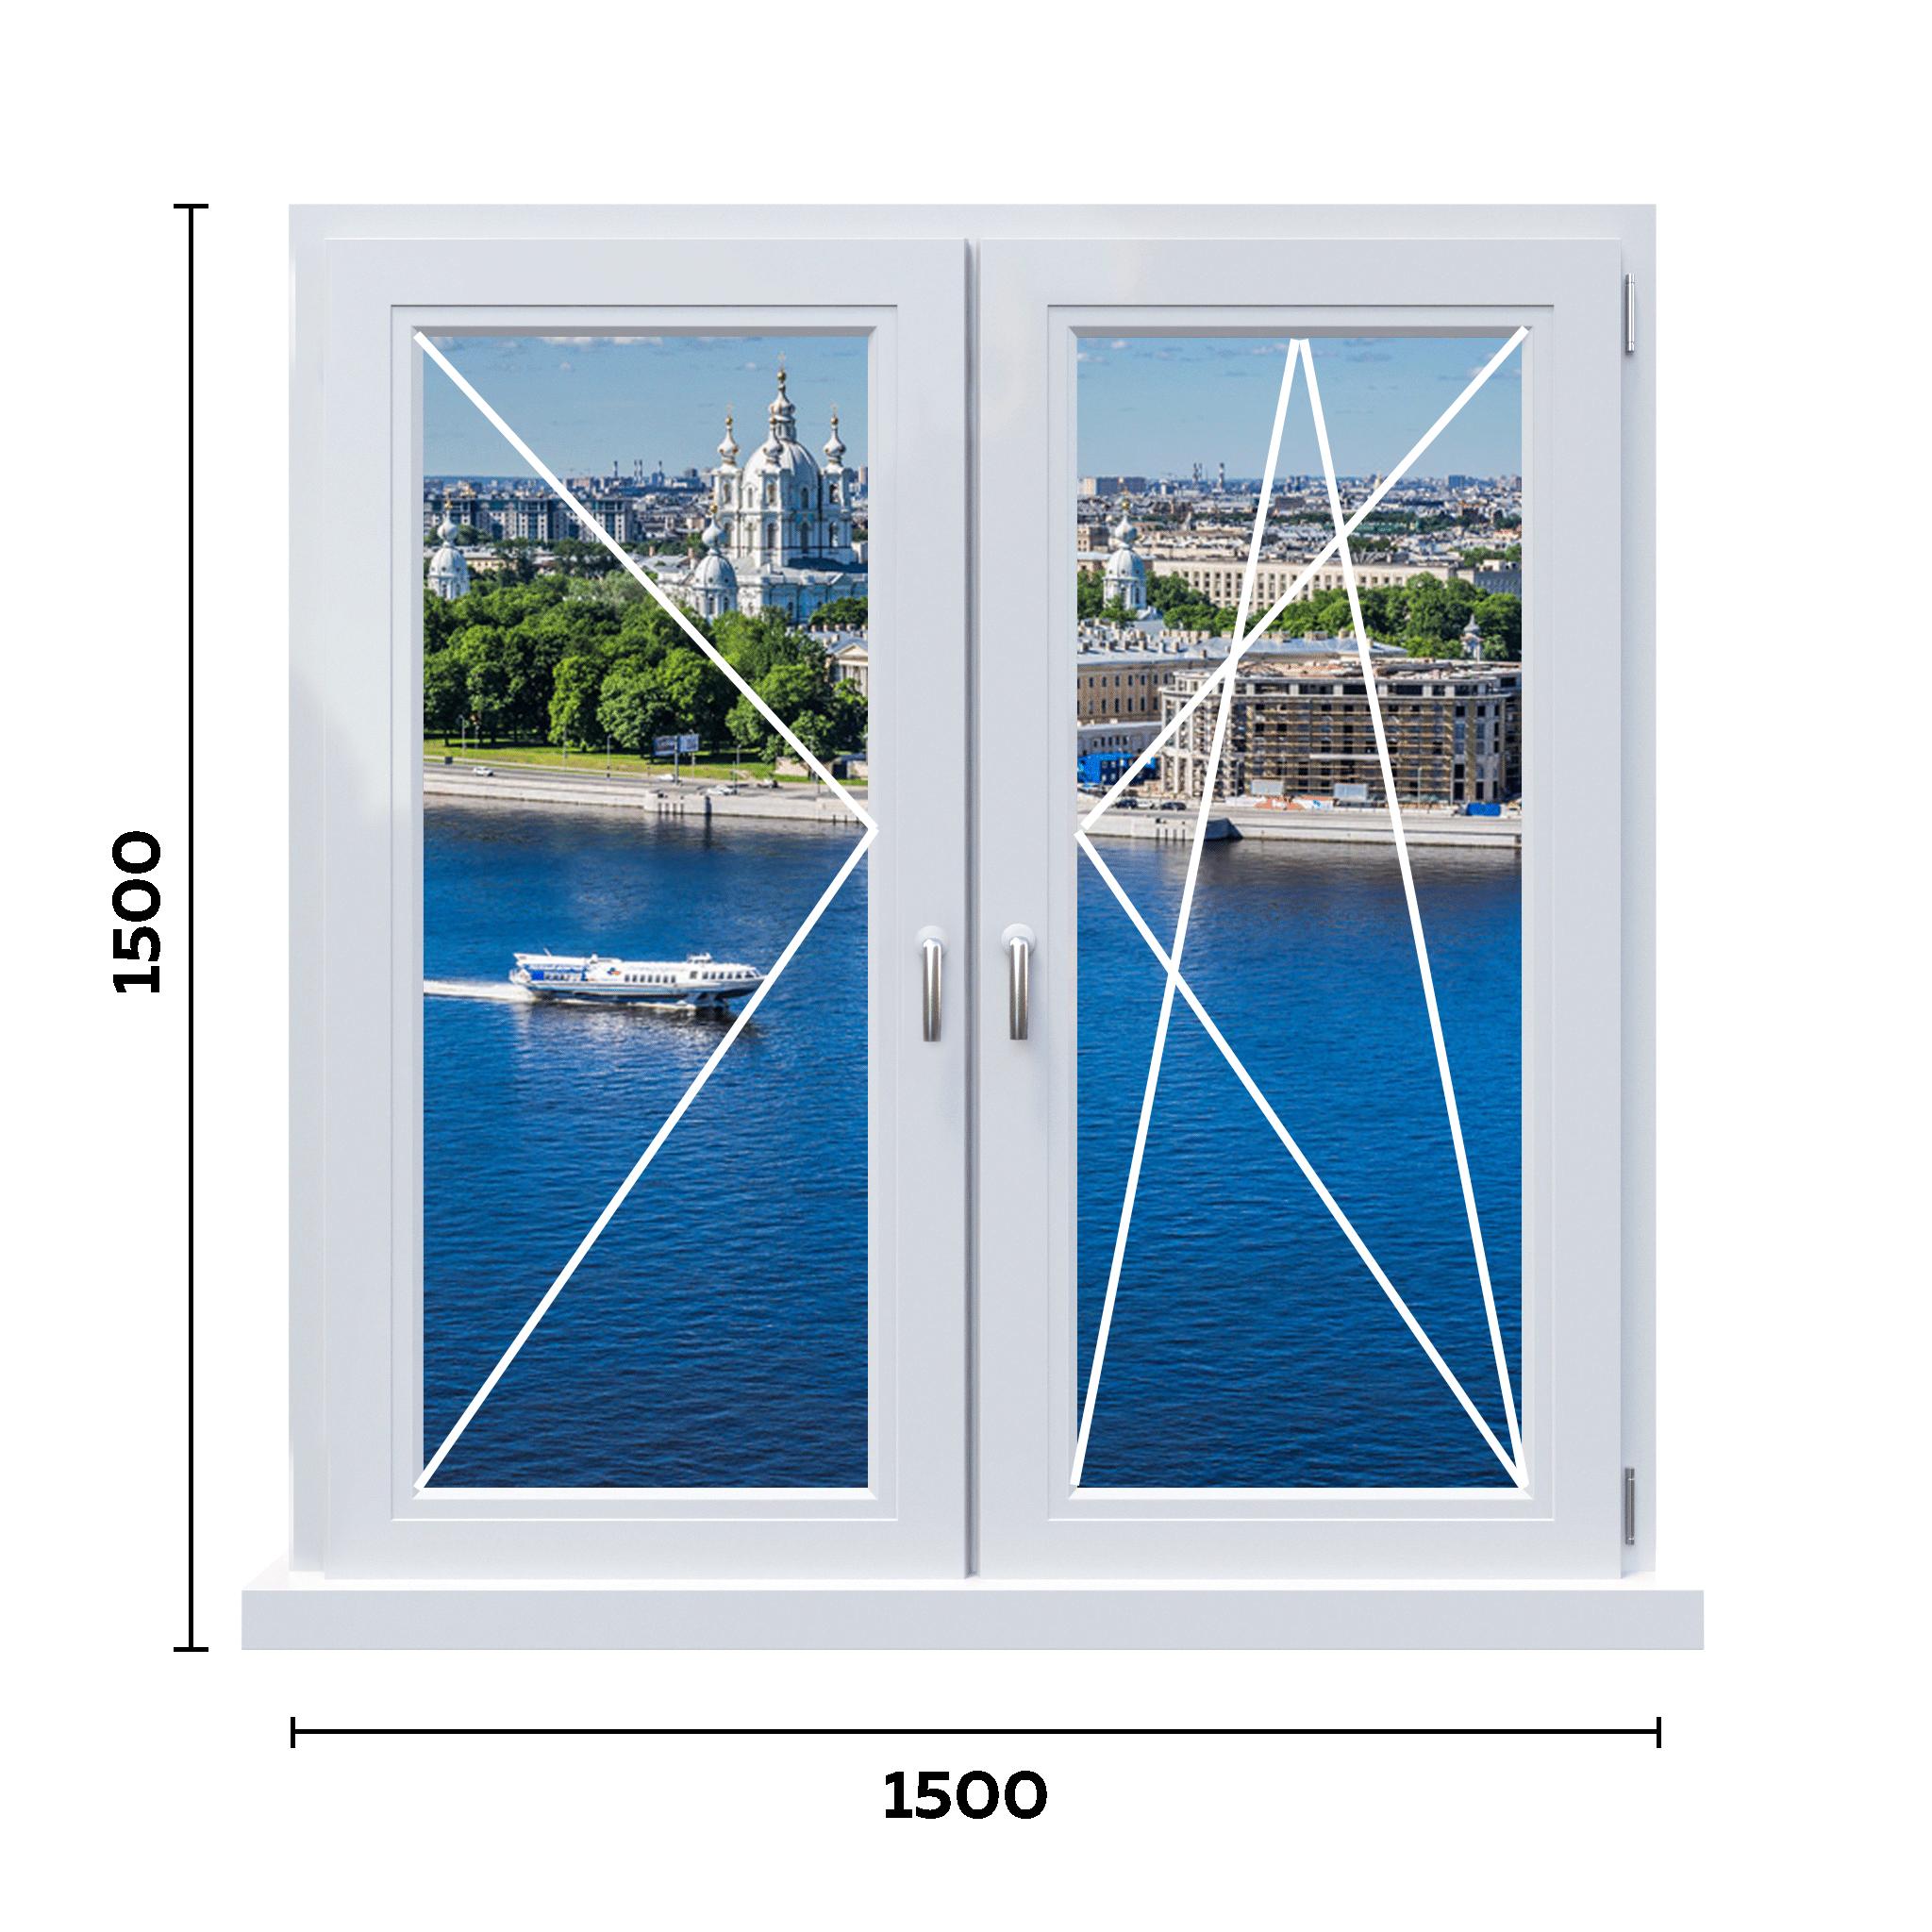 схема окна 1500мм вариант 1